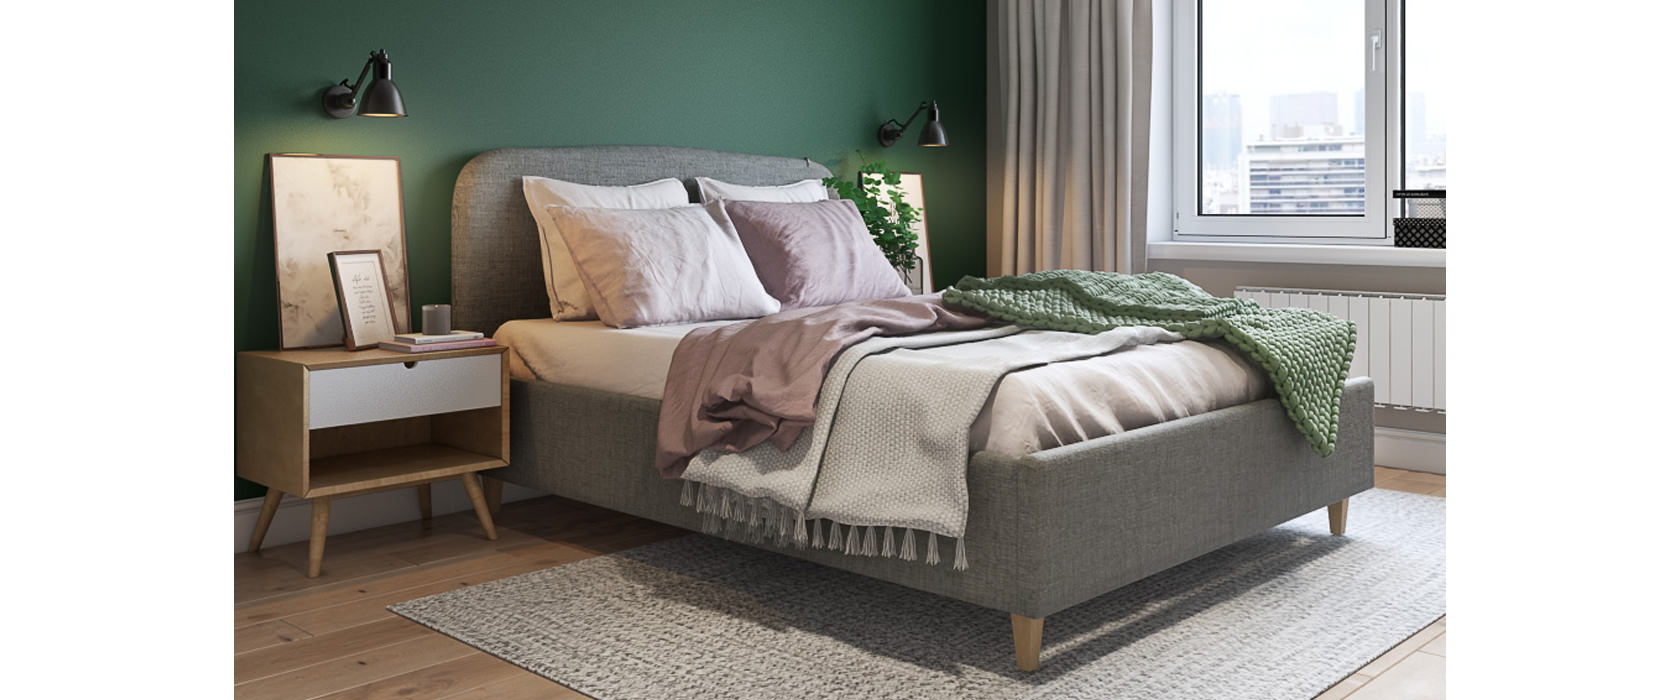 Кровать Adelina - Фото 2 - Pufetto